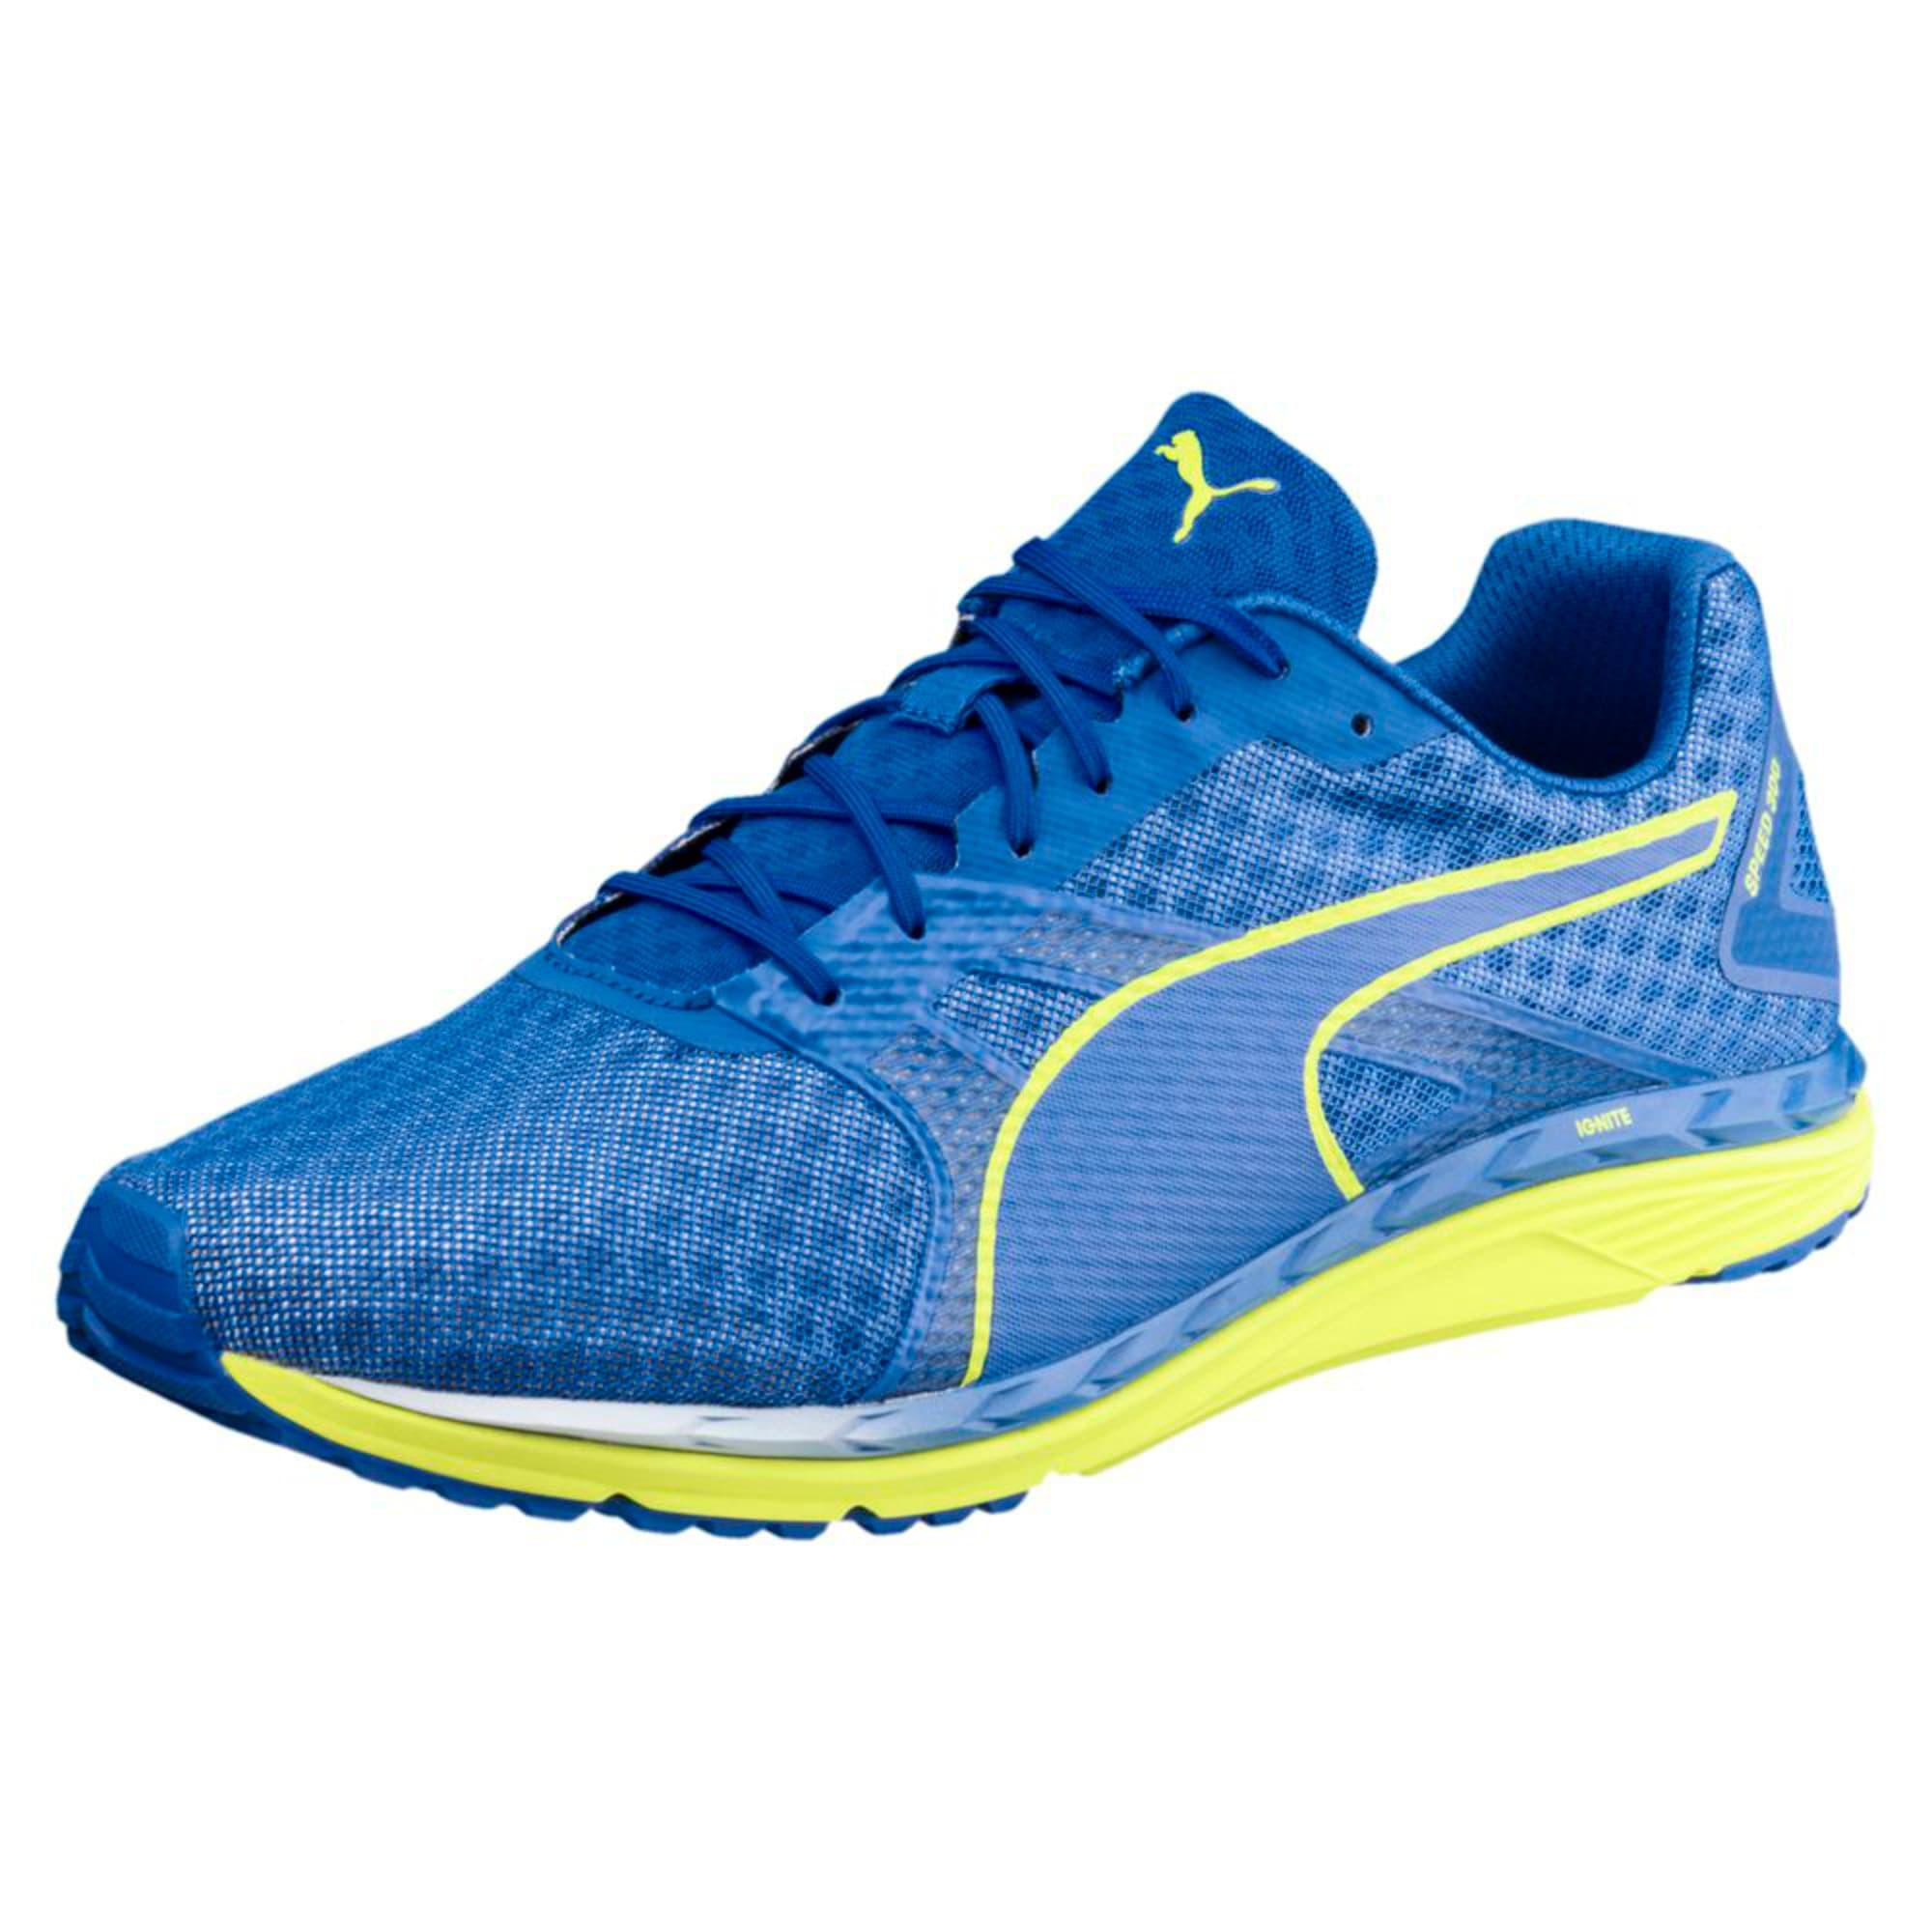 Thumbnail 1 of Speed 300 IGNITE 3 Men's Running Shoes, Turkish Sea-Peacoat-Yellow, medium-IND